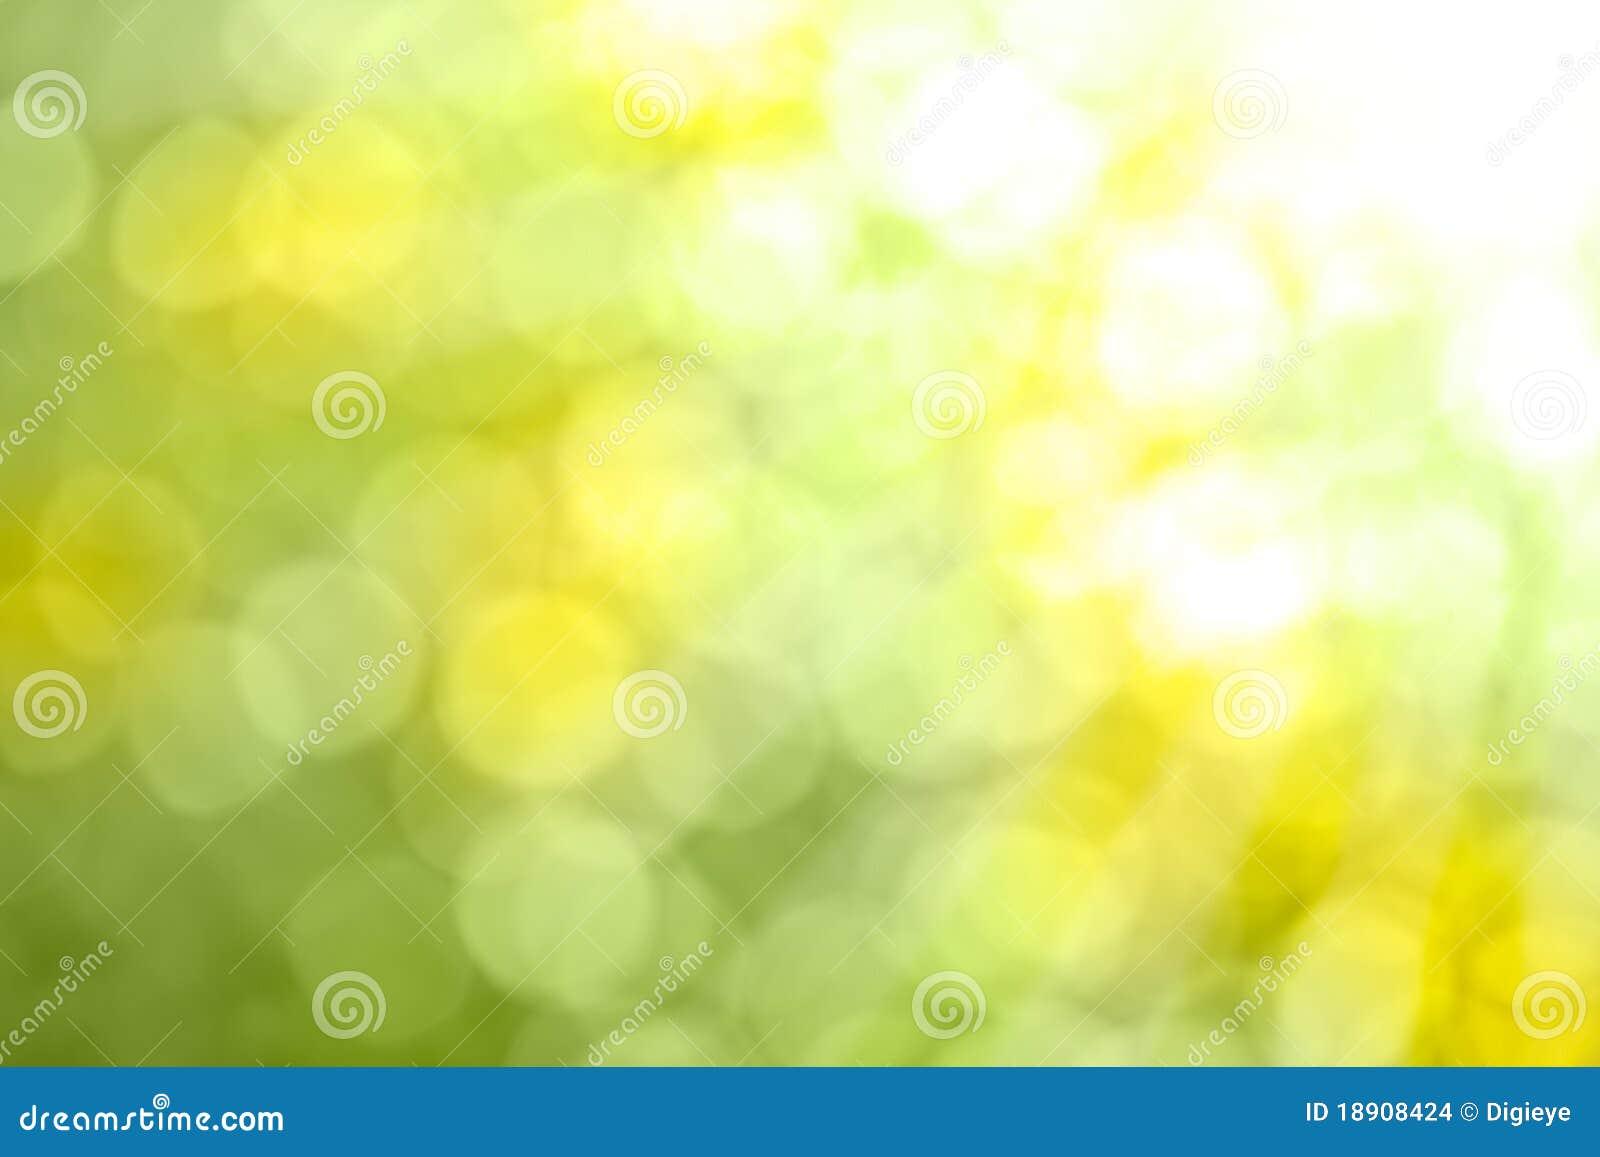 Natur Bokeh - abstrakter Hintergrund